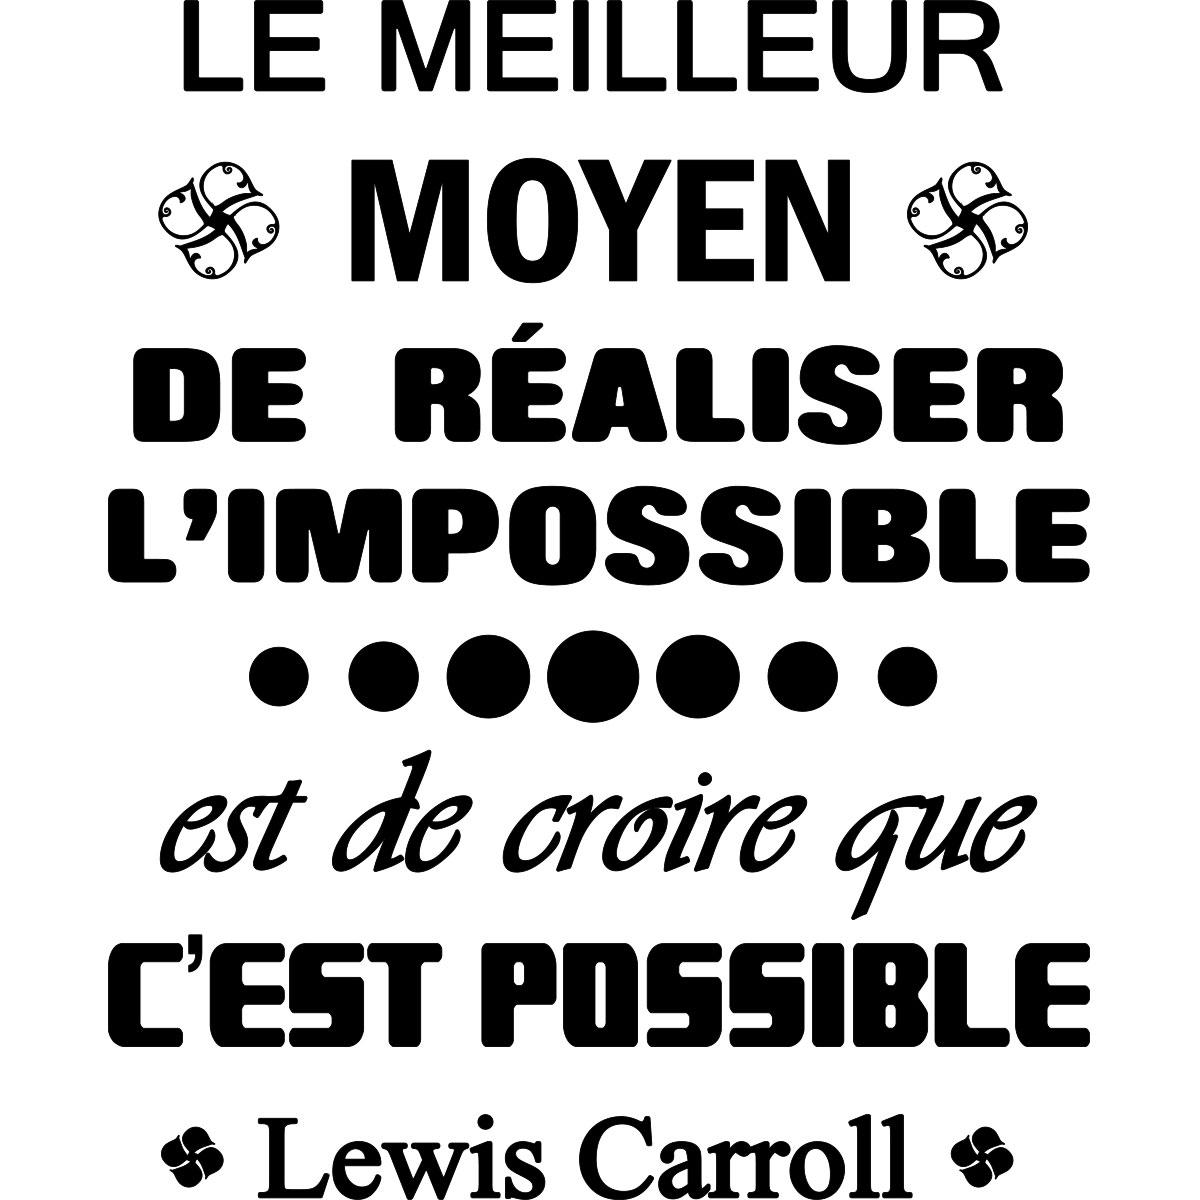 Sticker Citation Le Meilleur Moyen De Realiser Lewis Carroll